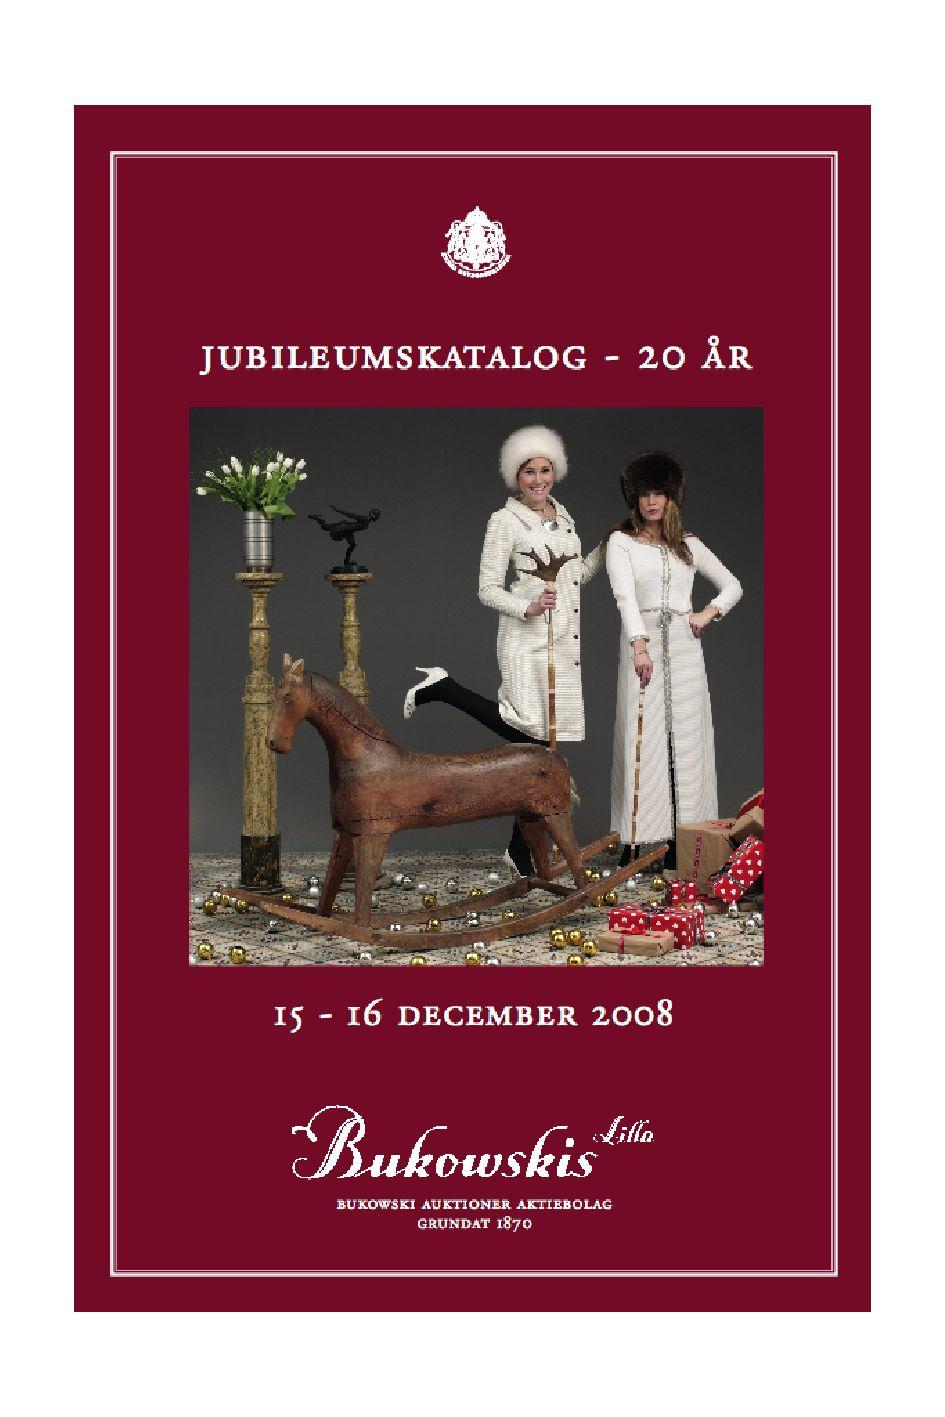 Lilla bukowskis jubileumskatalog s186 by bukowskis   issuu